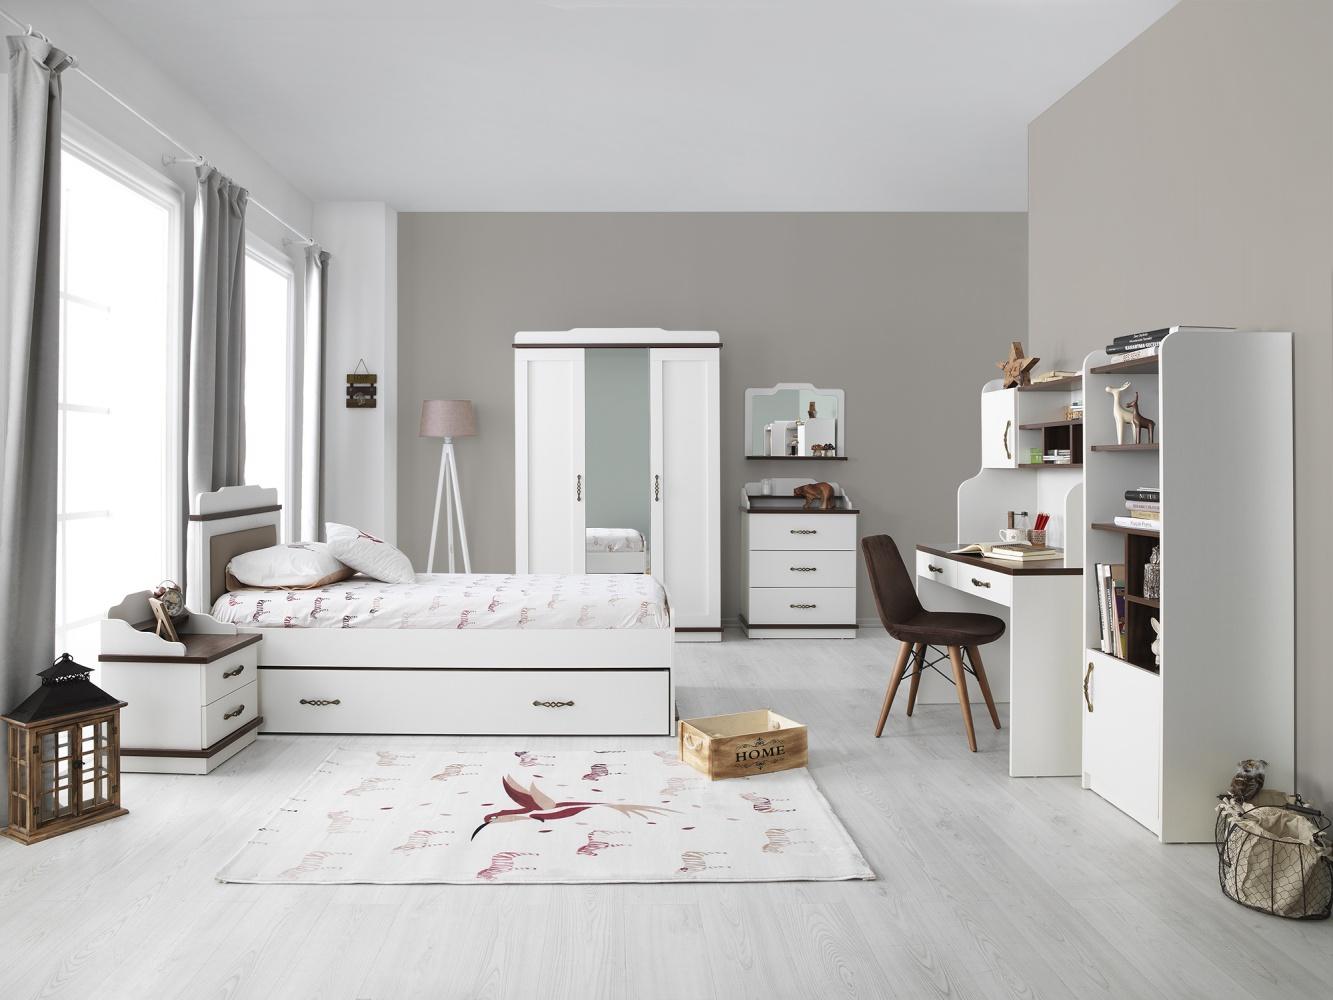 Full Size of 5de70b1b67f56 Komplette Schlafzimmer Möbel Boss Betten Ausziehbares Bett Bette Duschwanne Massiv 120x200 Weiß Günstige 140x200 Massivholz 180x200 Weiße Wohnzimmer Bett 120x200 Komplett Set